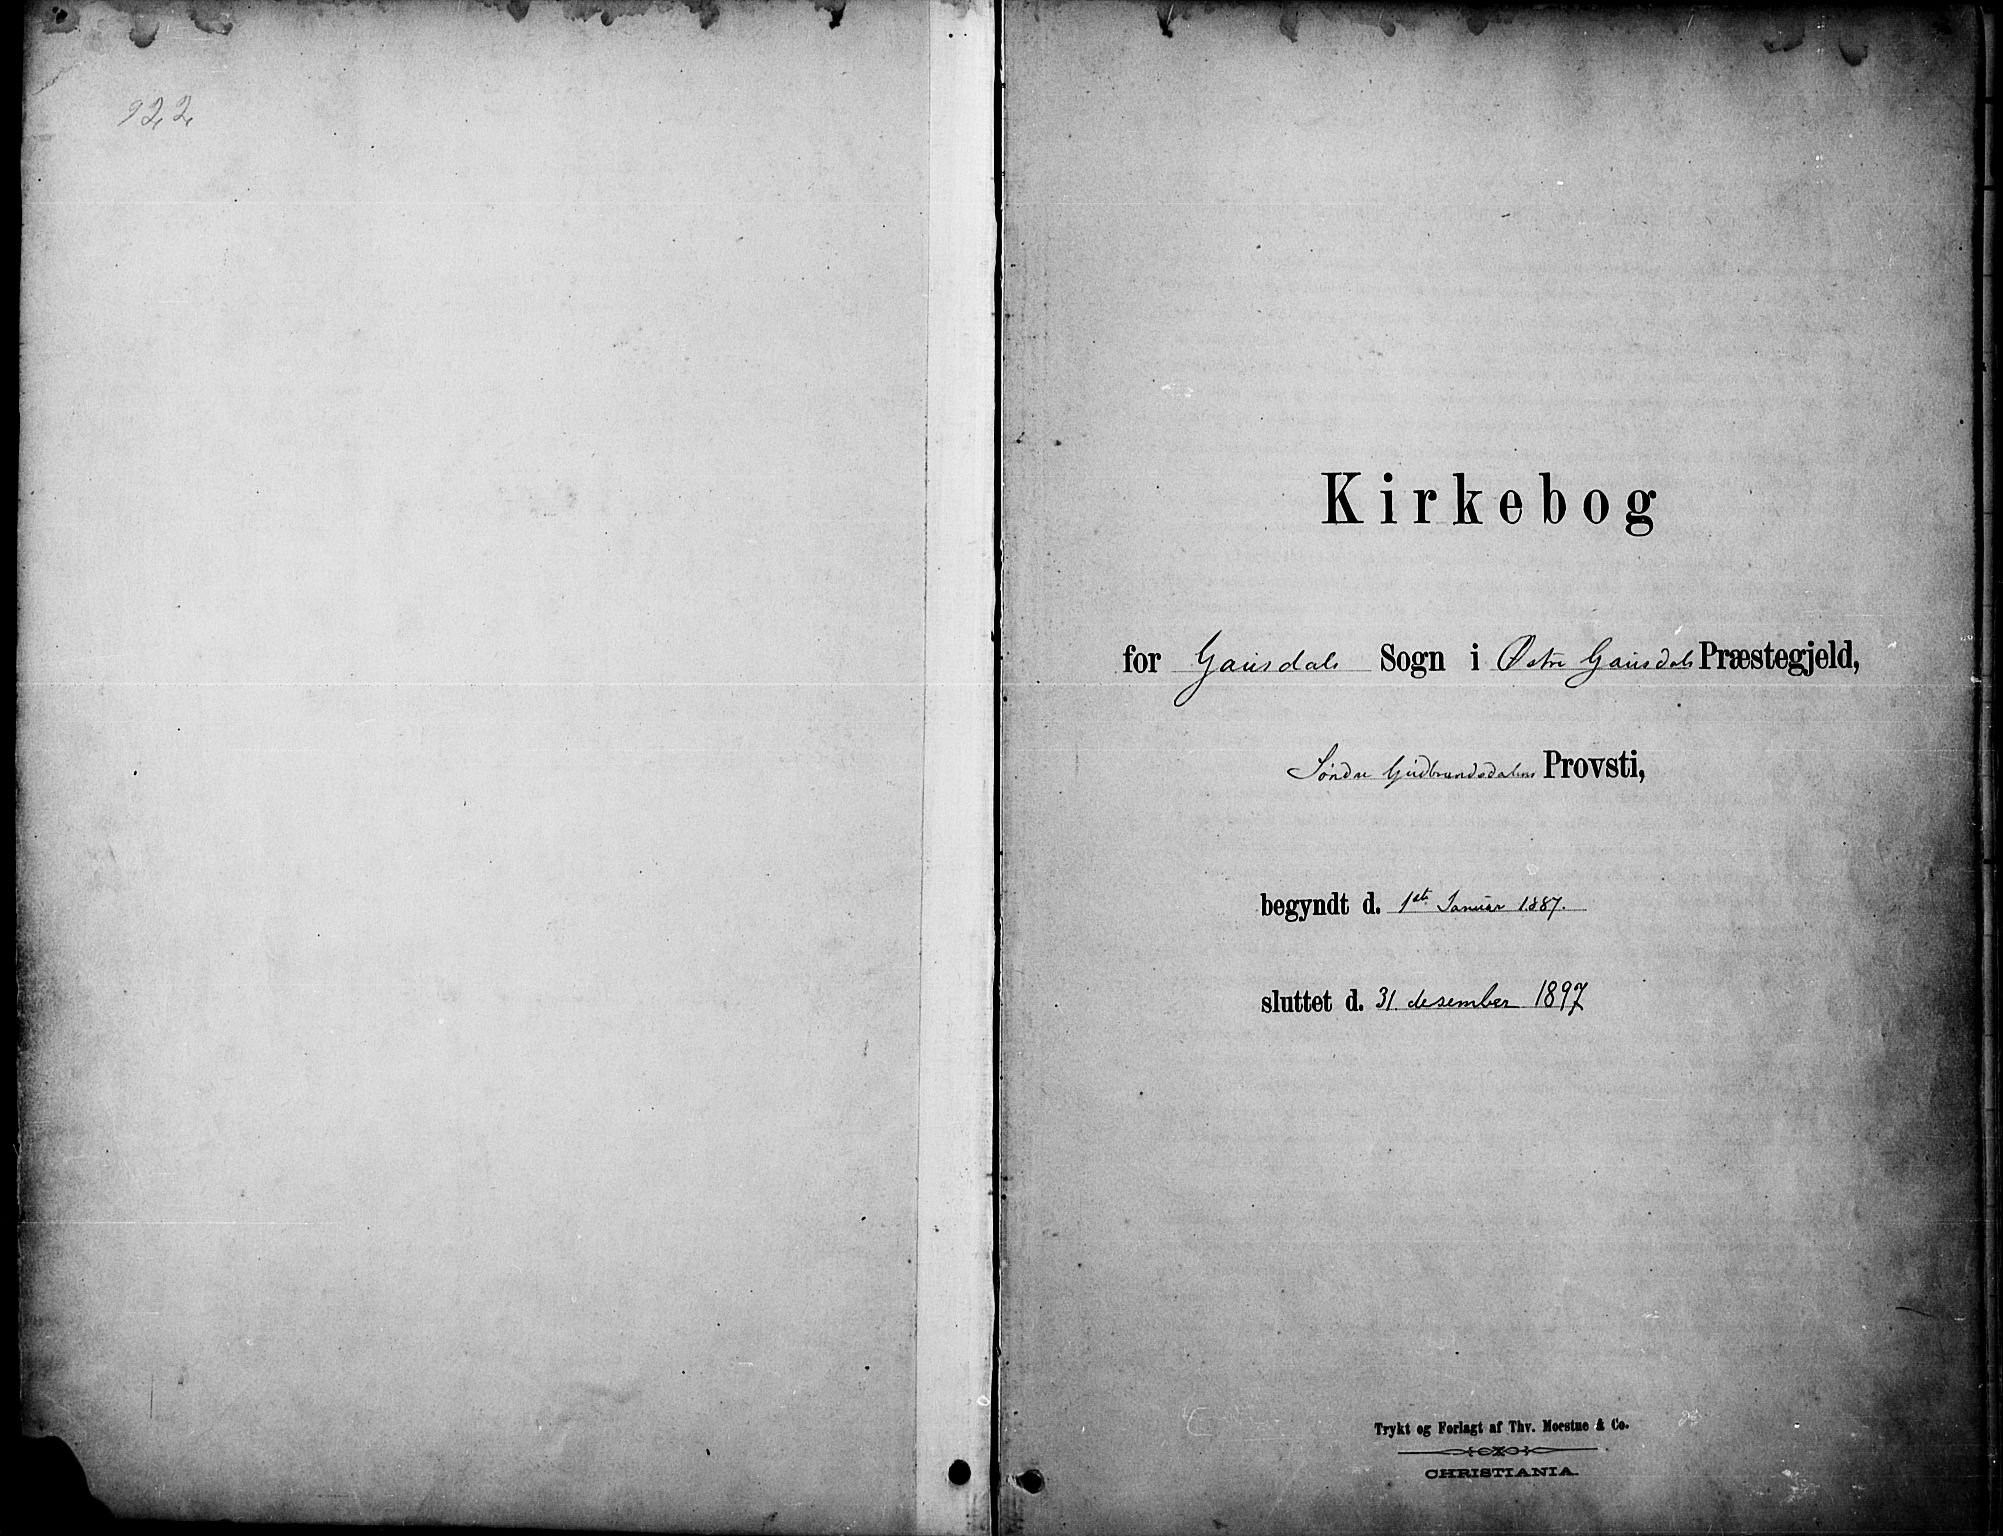 SAH, Østre Gausdal prestekontor, Ministerialbok nr. 2, 1887-1897